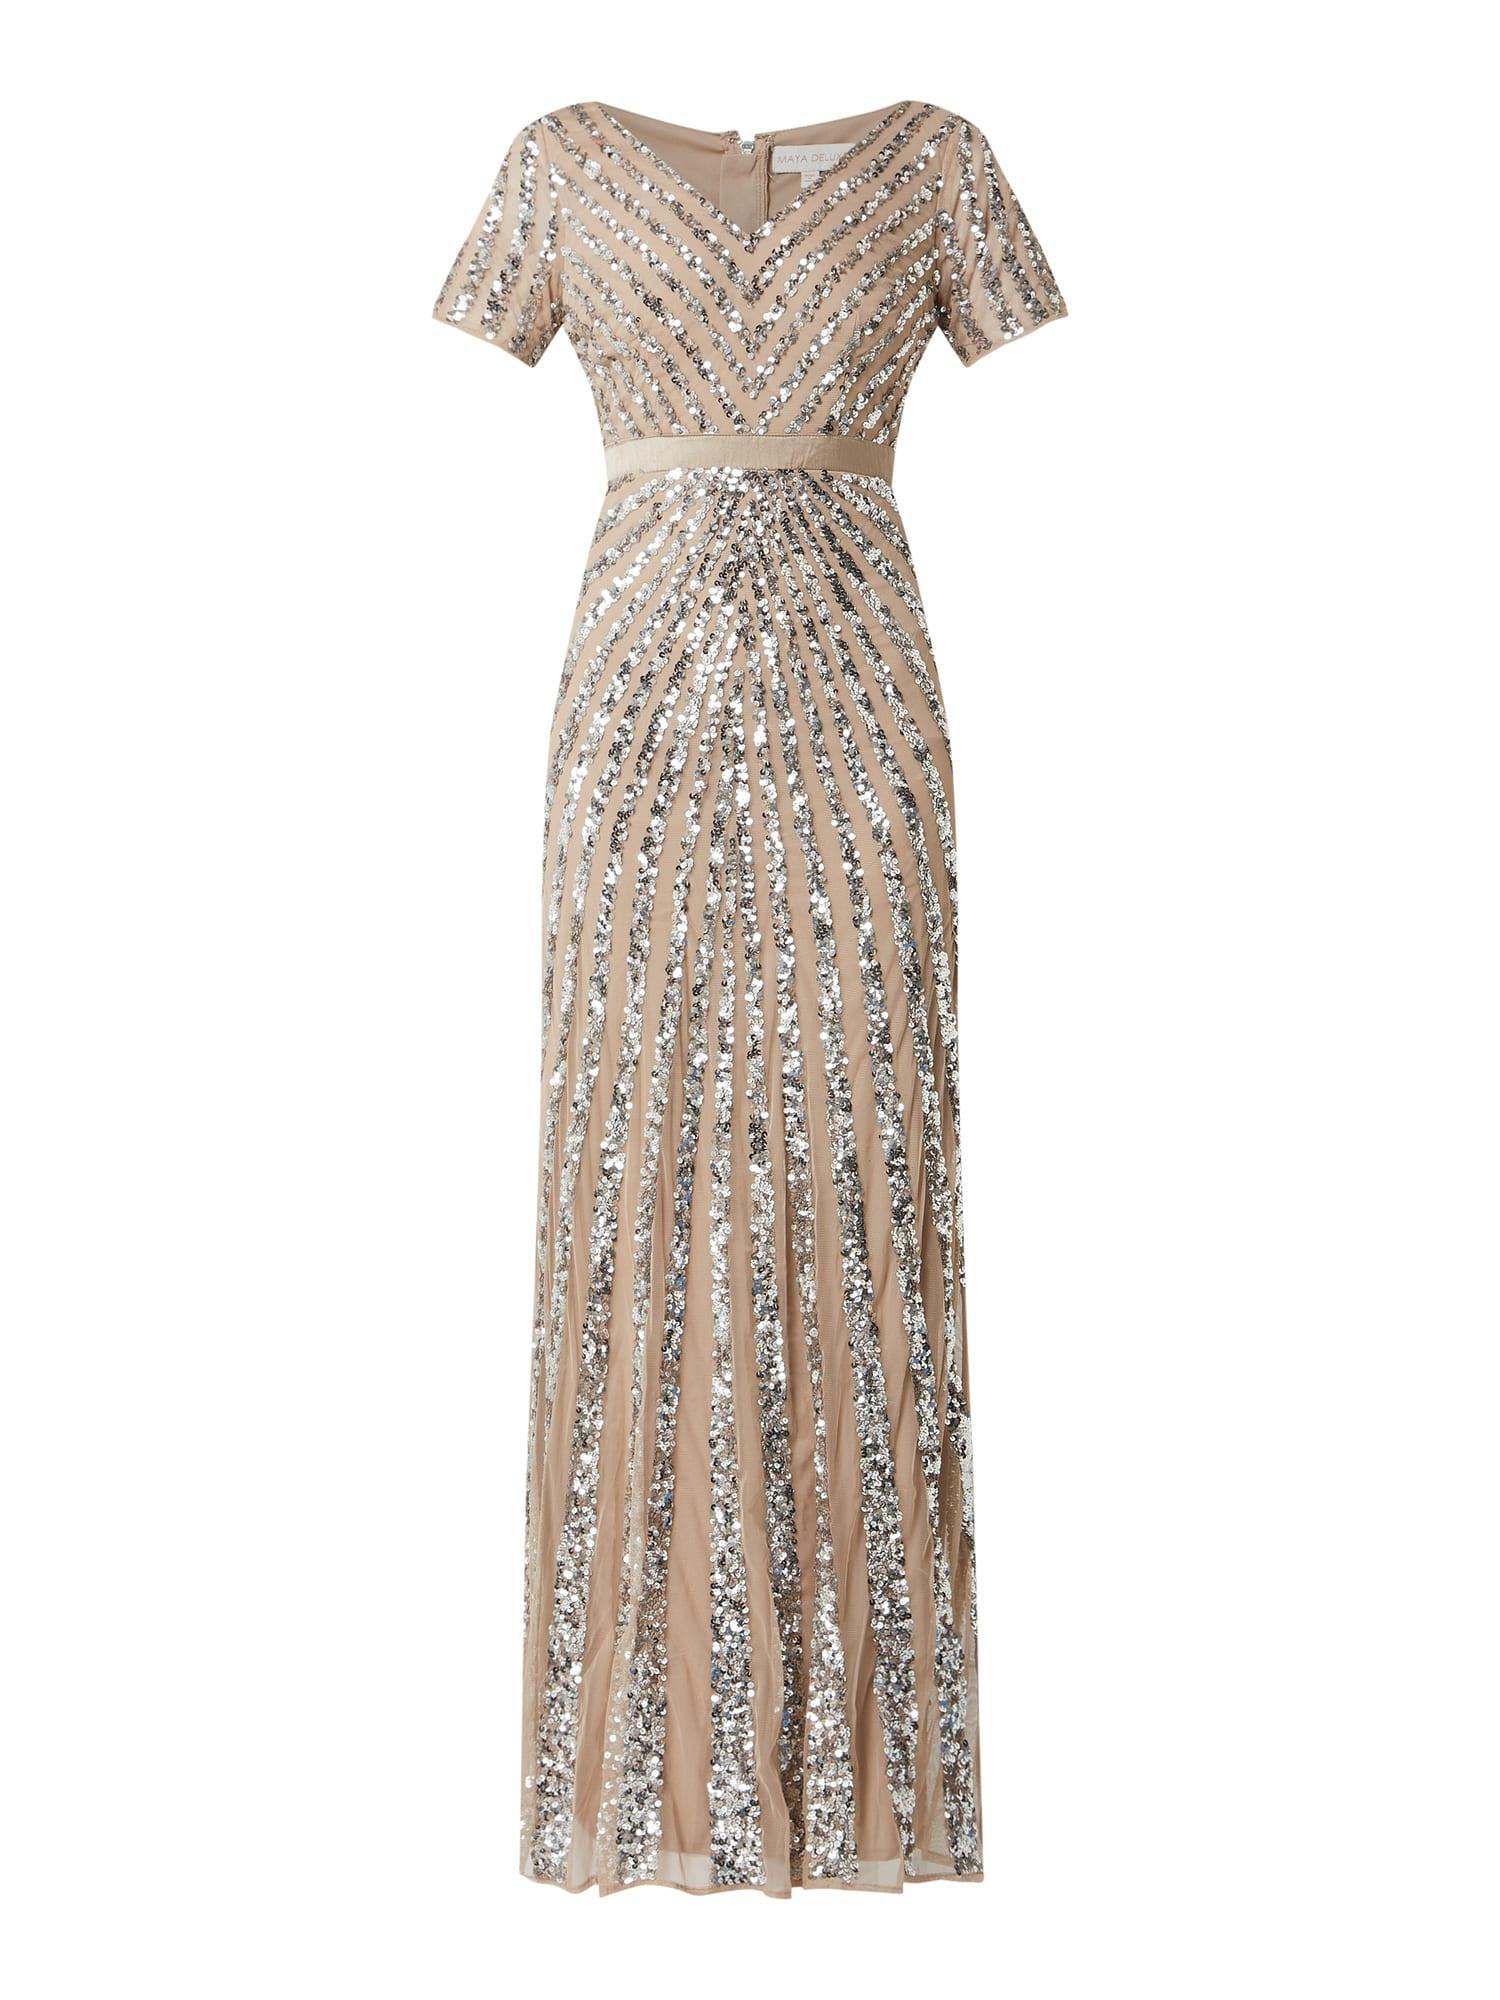 Designer Kreativ Maya Abendkleid Stylish15 Spektakulär Maya Abendkleid Boutique